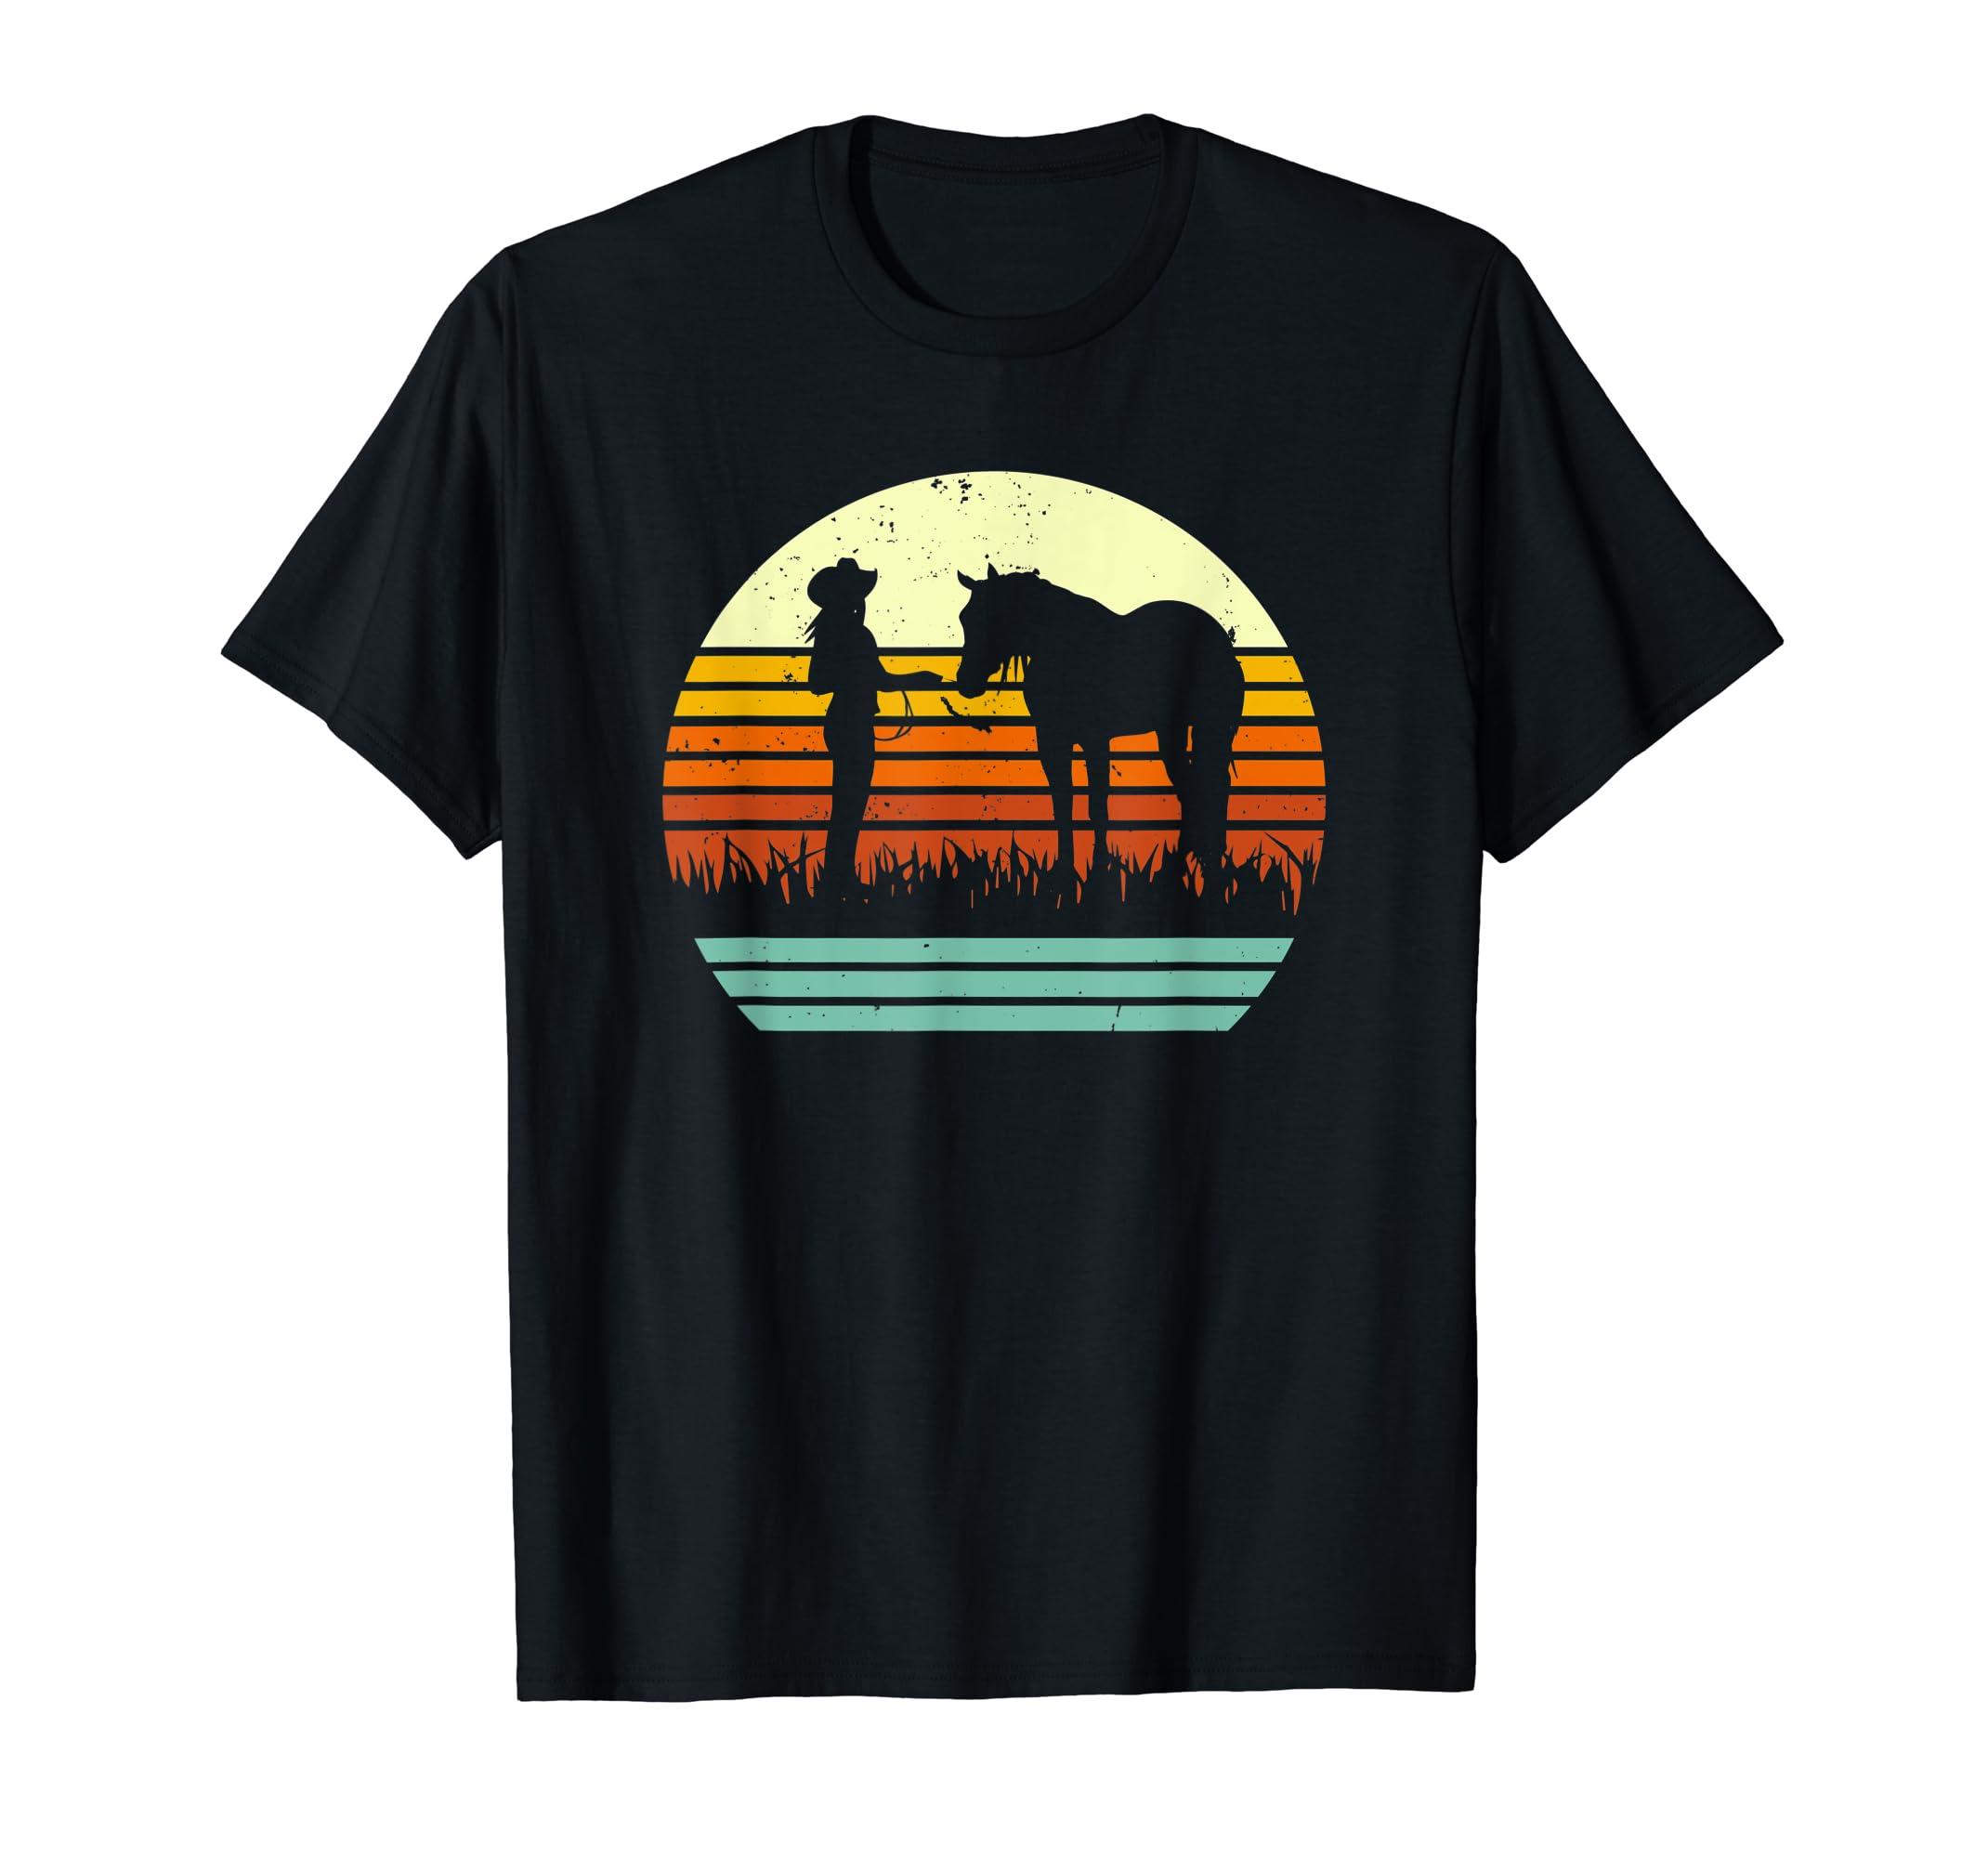 Halter Horse Horse Show Retro Style T-Shirt-Men's T-Shirt-Black